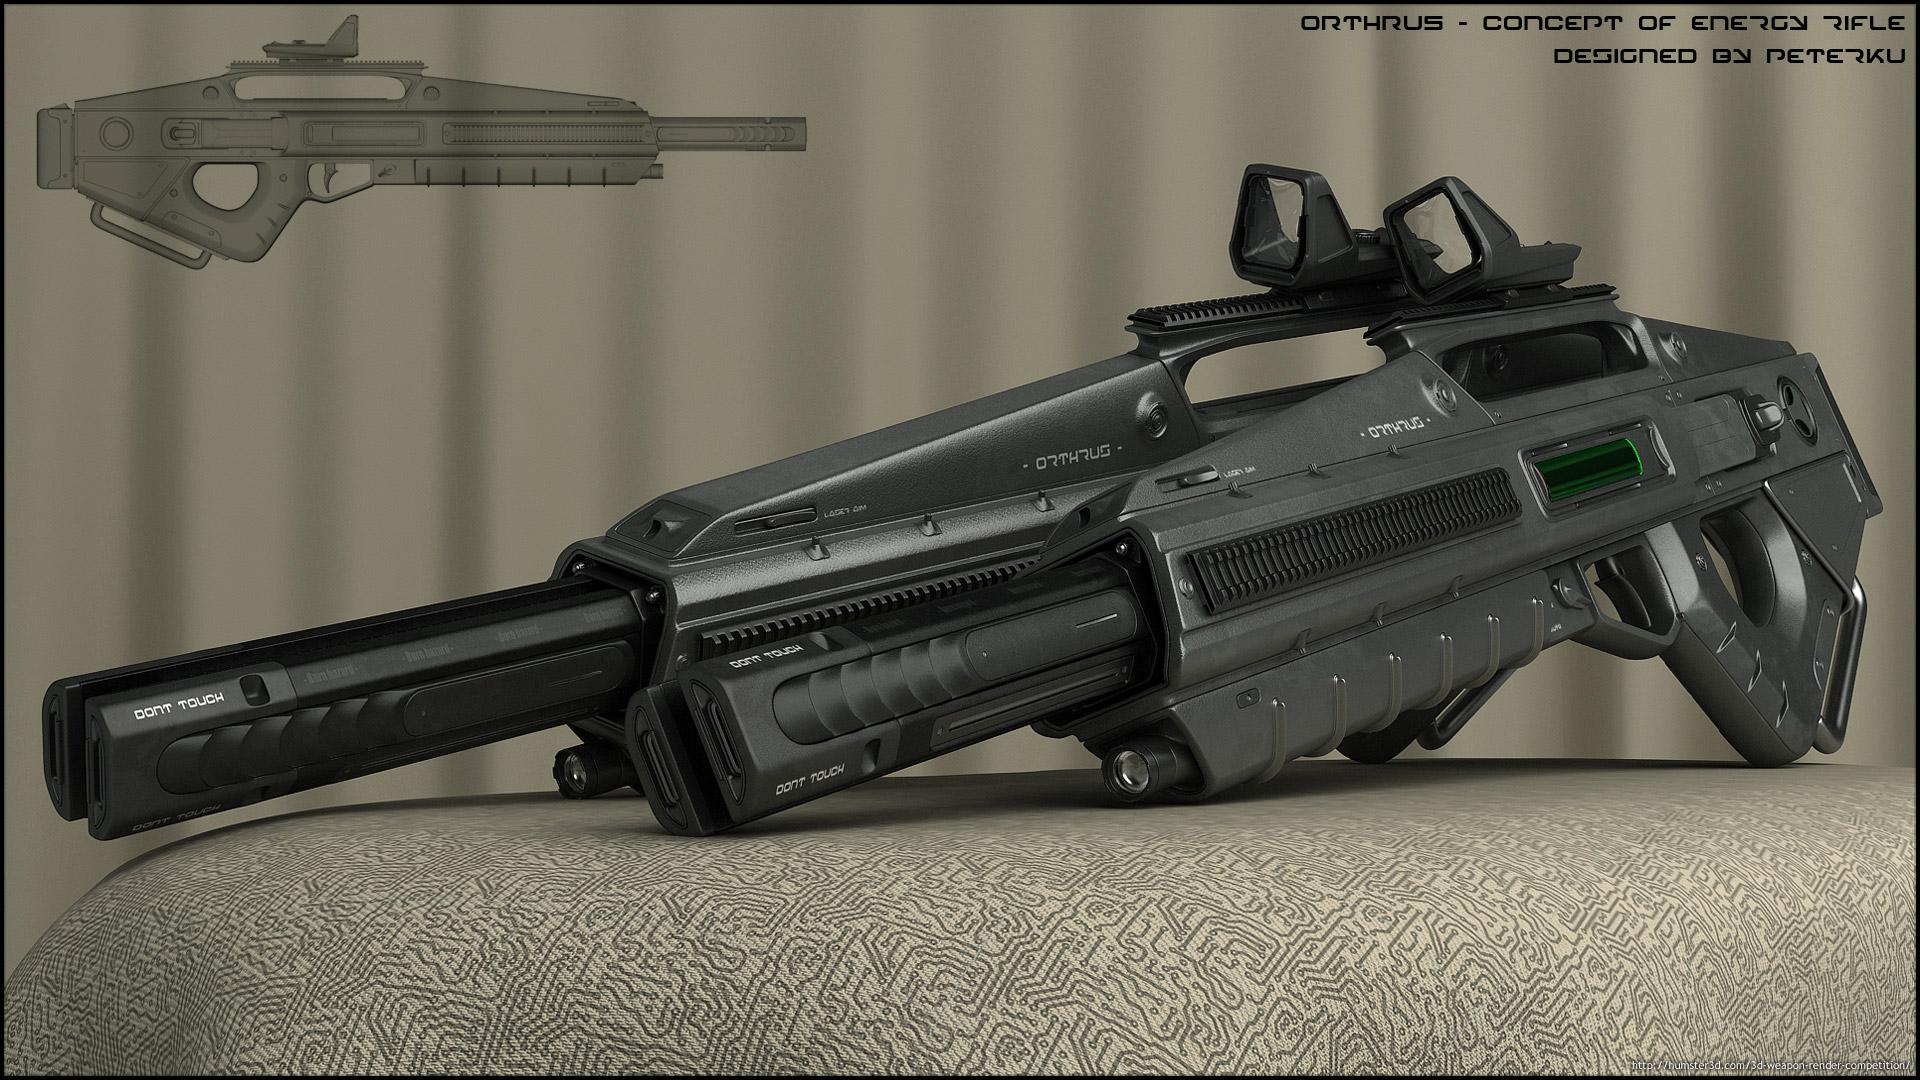 Orthrus - concept of energy rifle 3d art